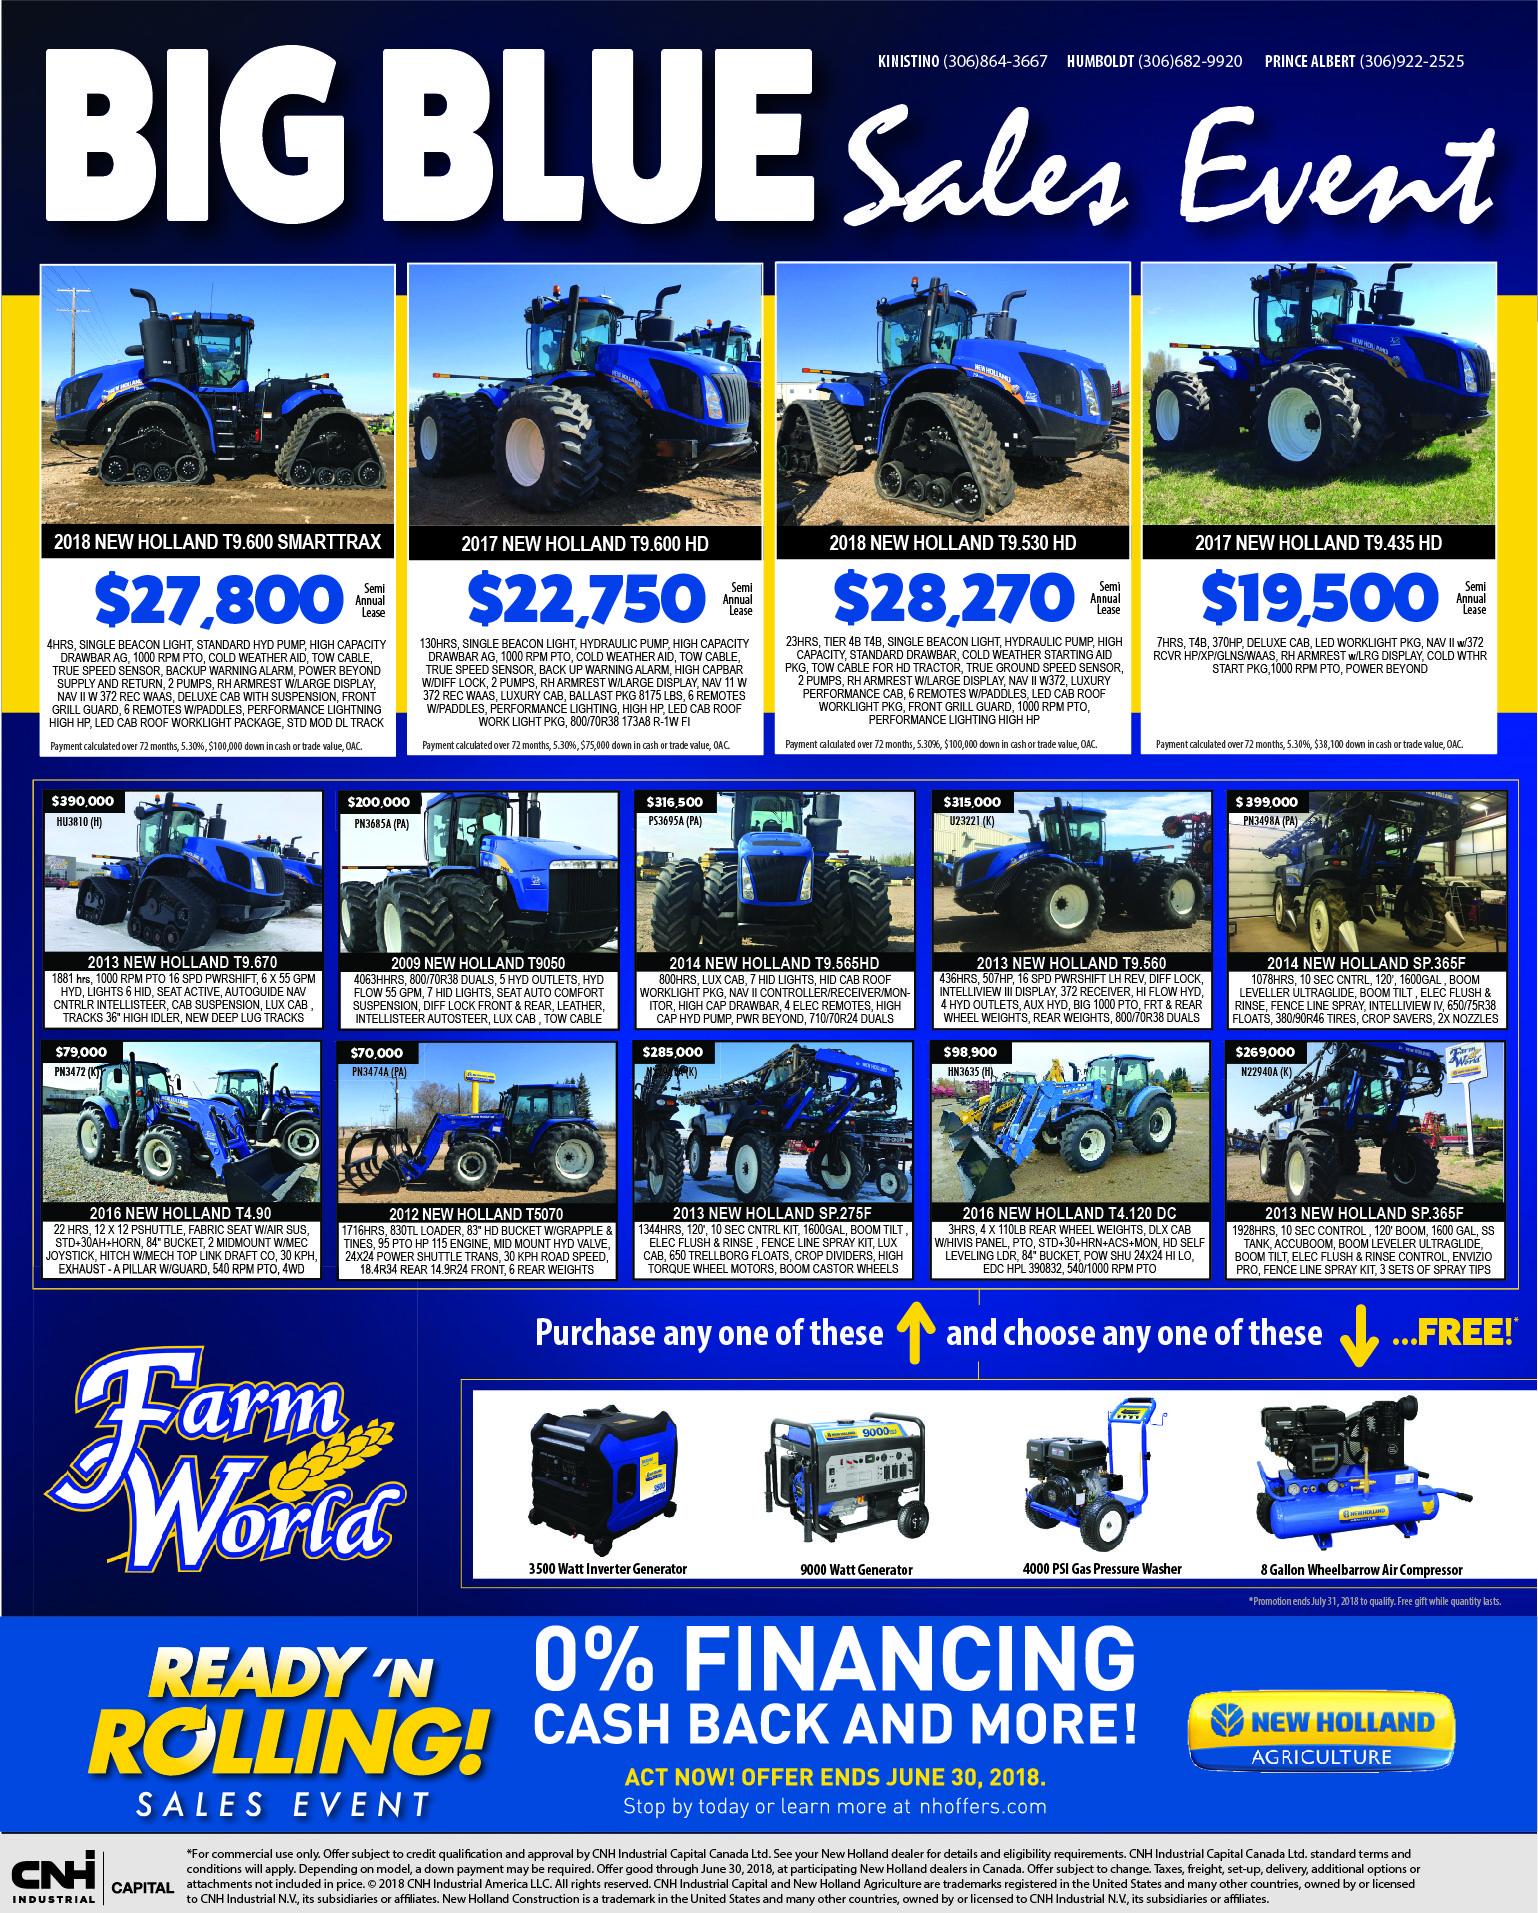 BIG BLUE Sales Event - Image 1